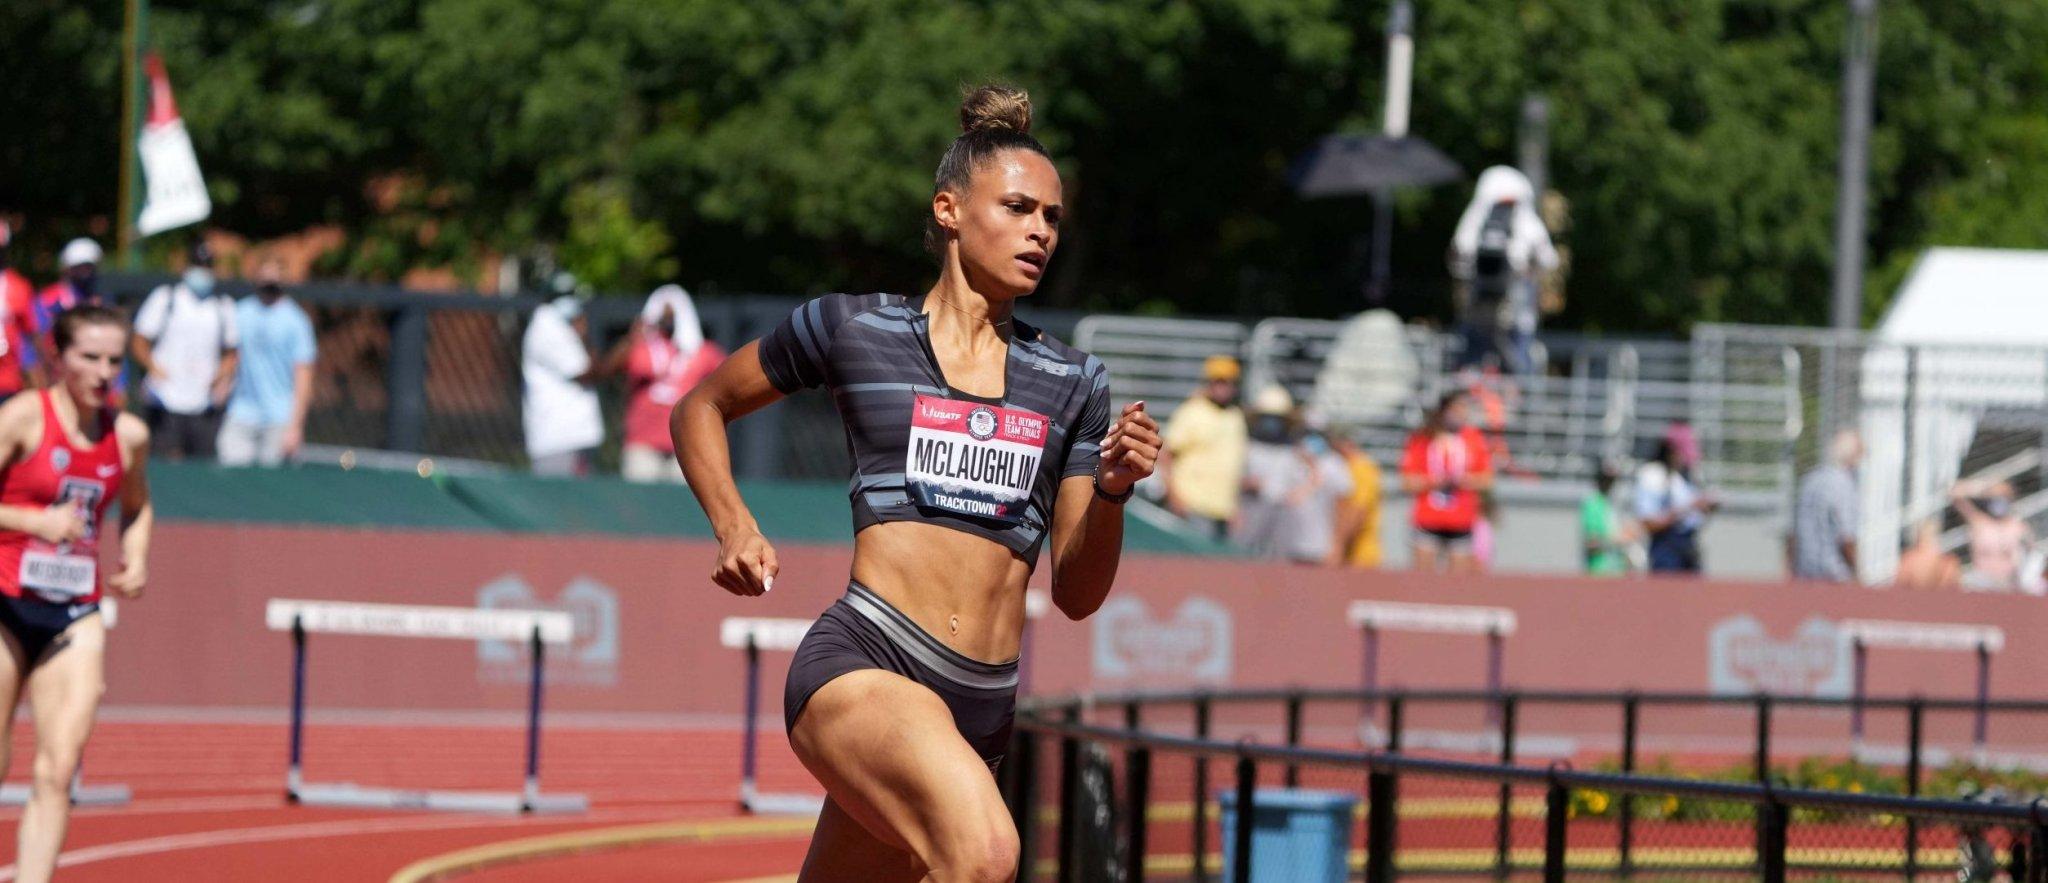 Athletics-American McLaughlin breaks women's 400m hurdles world record